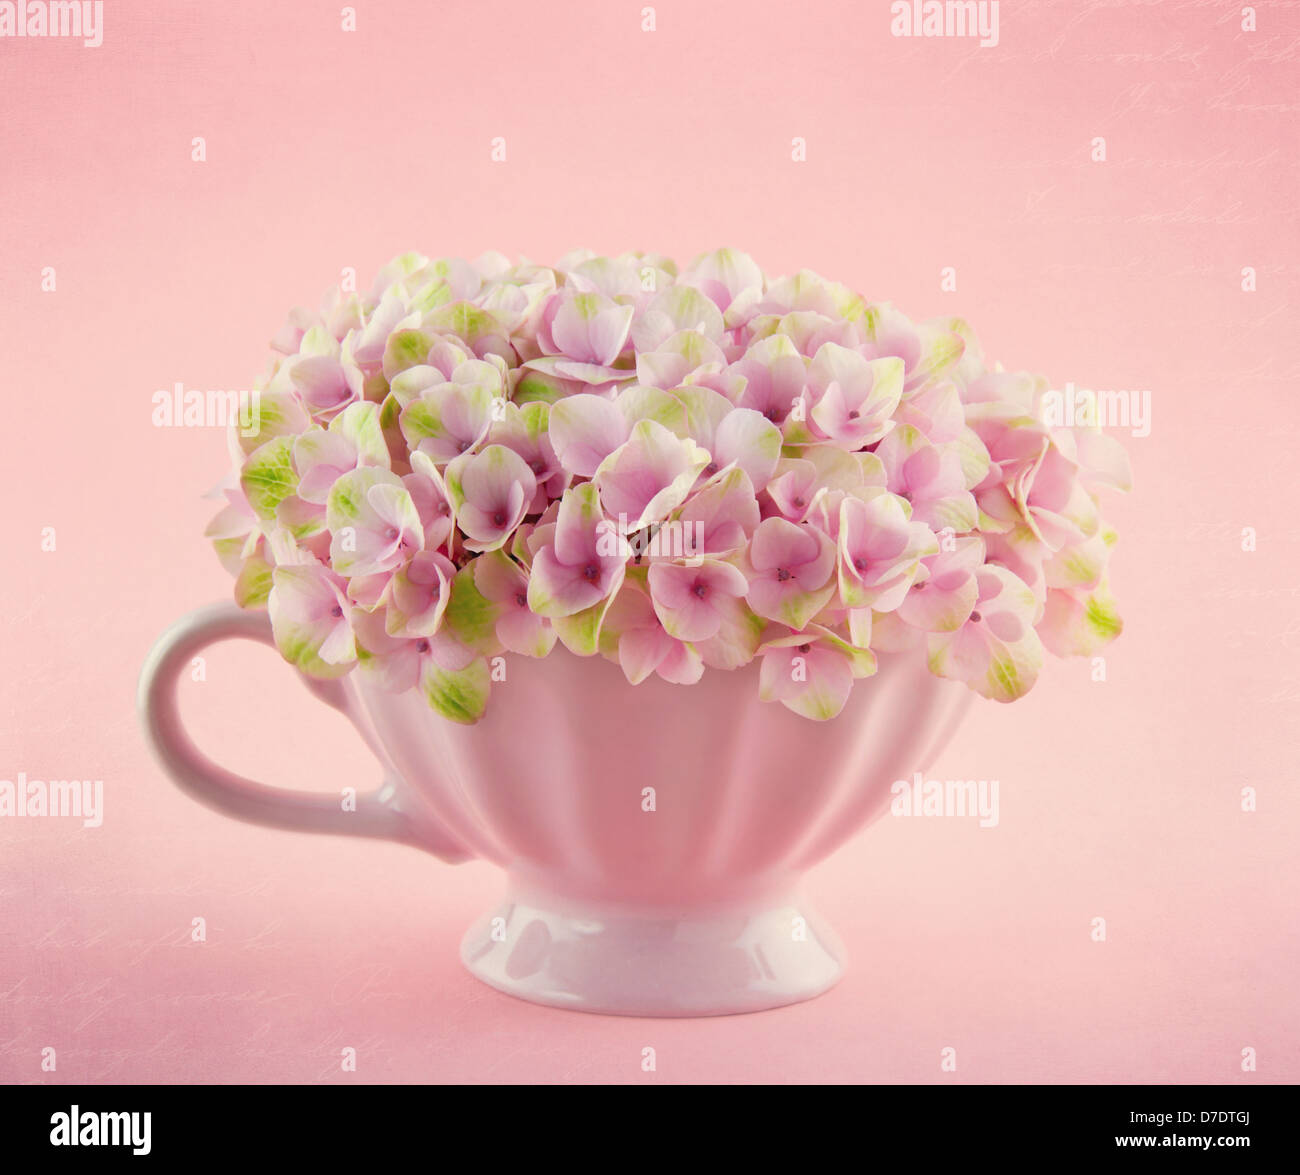 Pink Hydrangea Flowers In A Shabby Chic Mug On Pastel